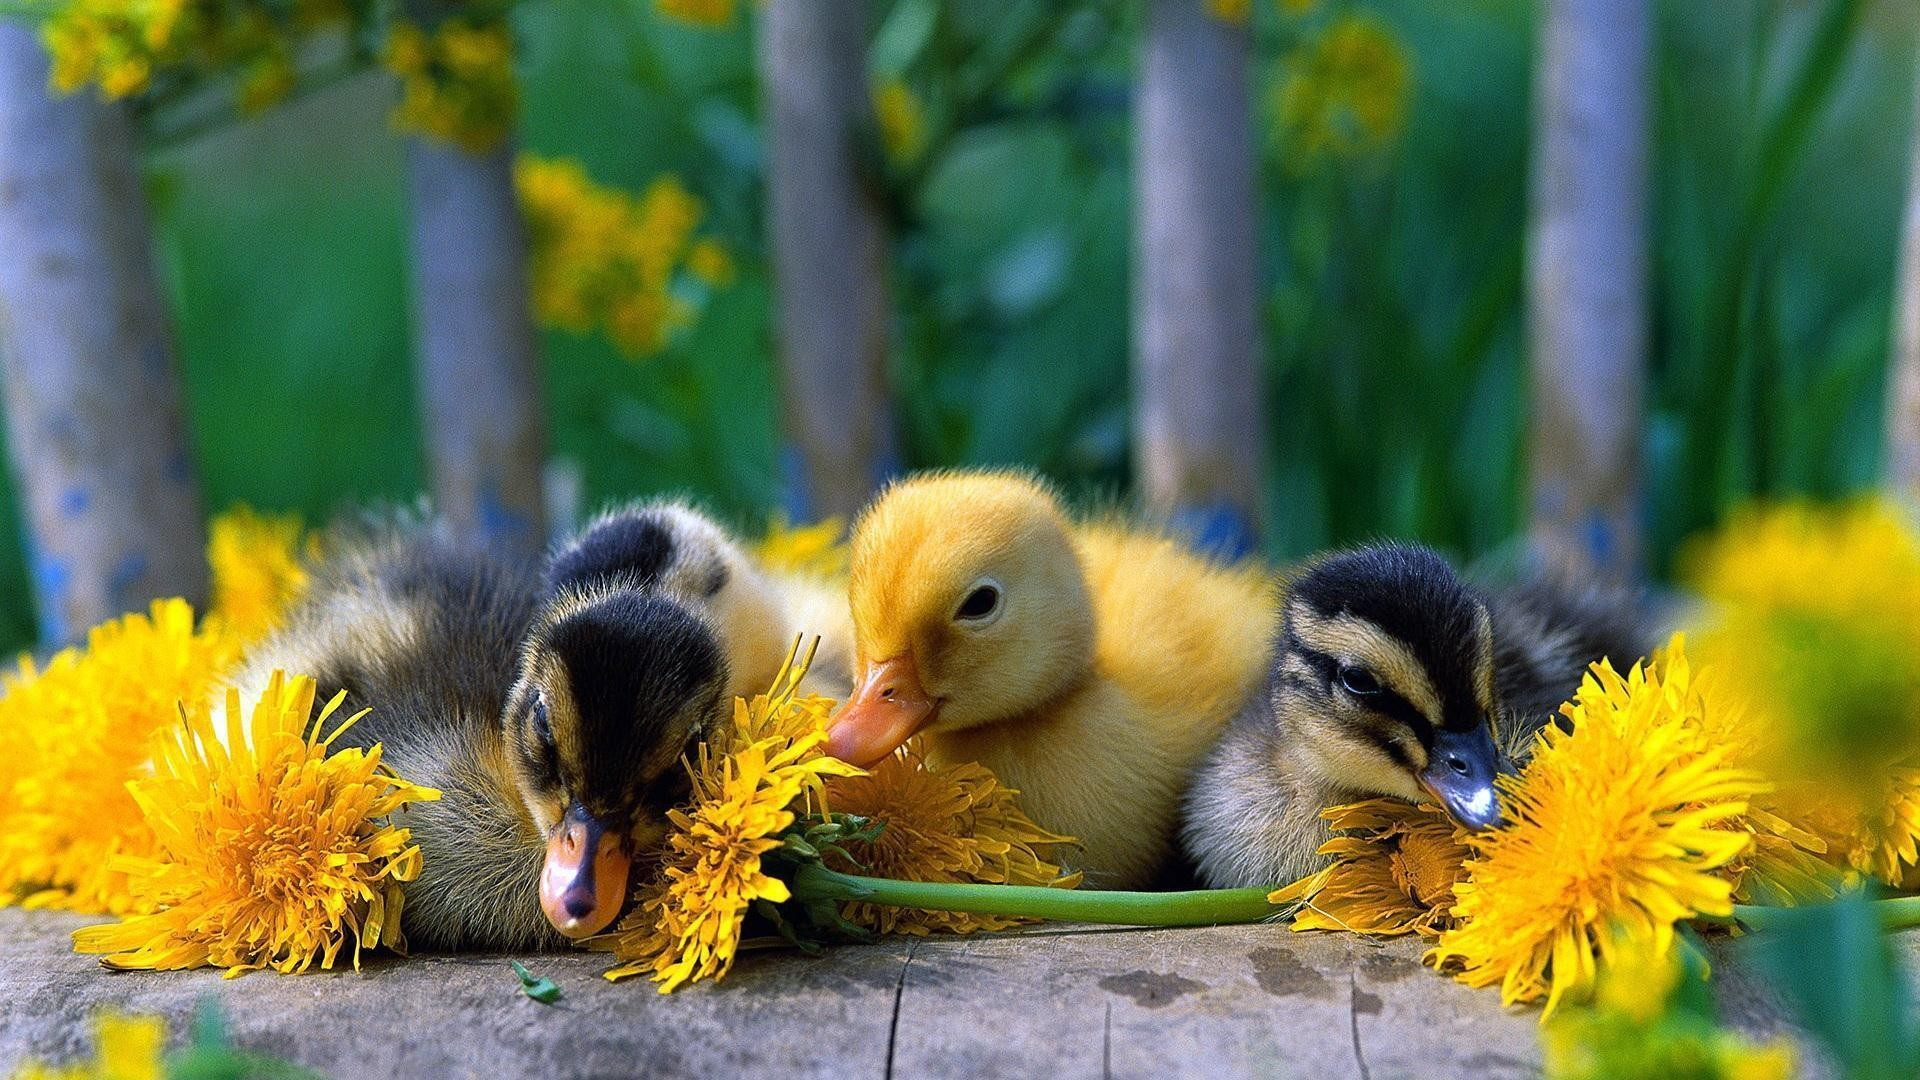 Res: 1920x1080, Baby Duck Wallpapers 37